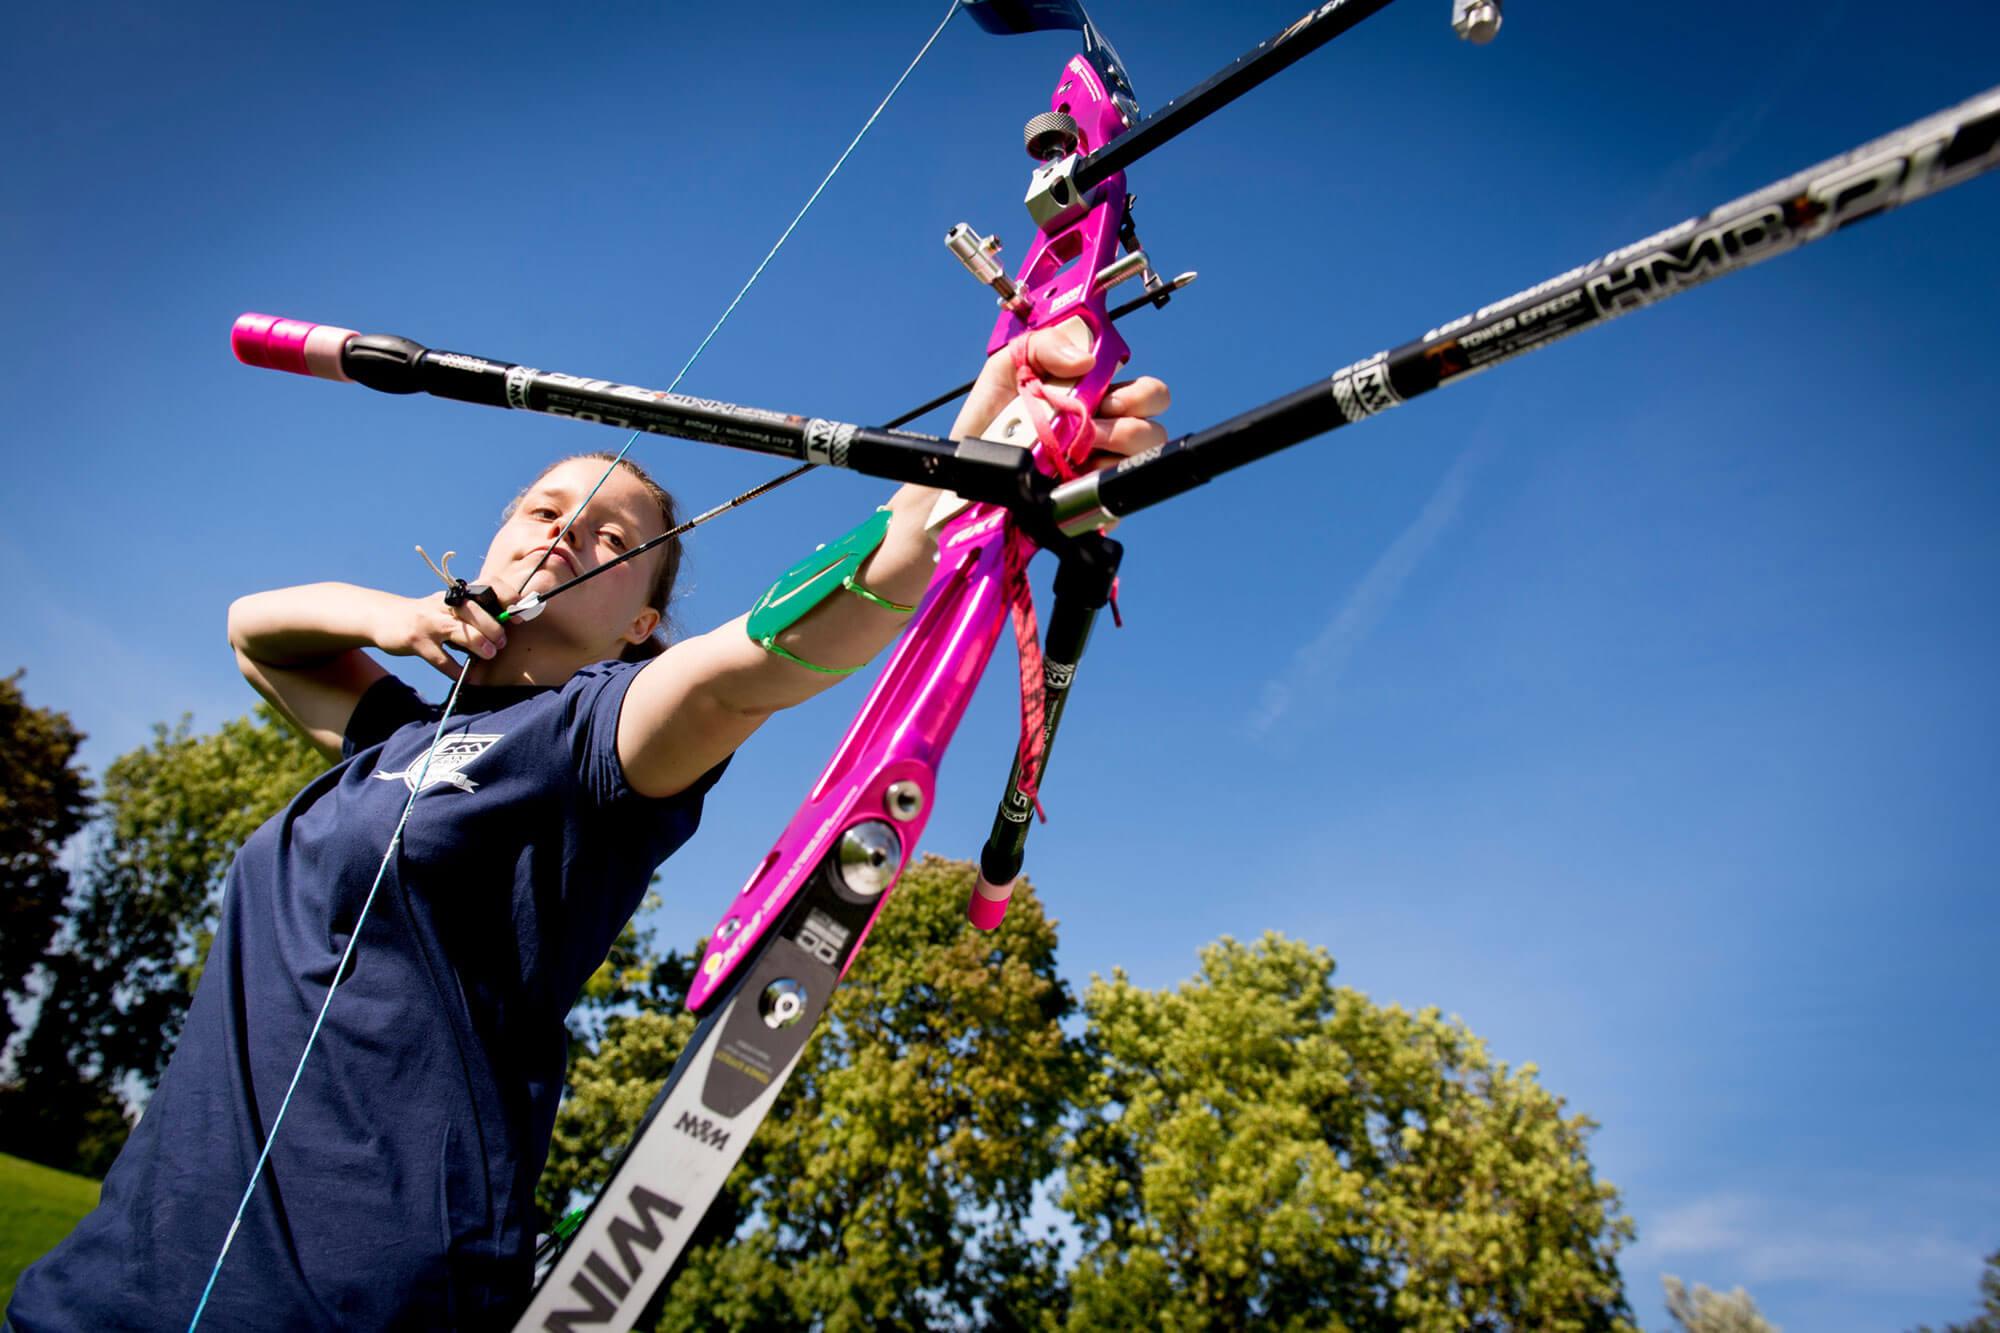 Philippa Taylor - Archery Scholar